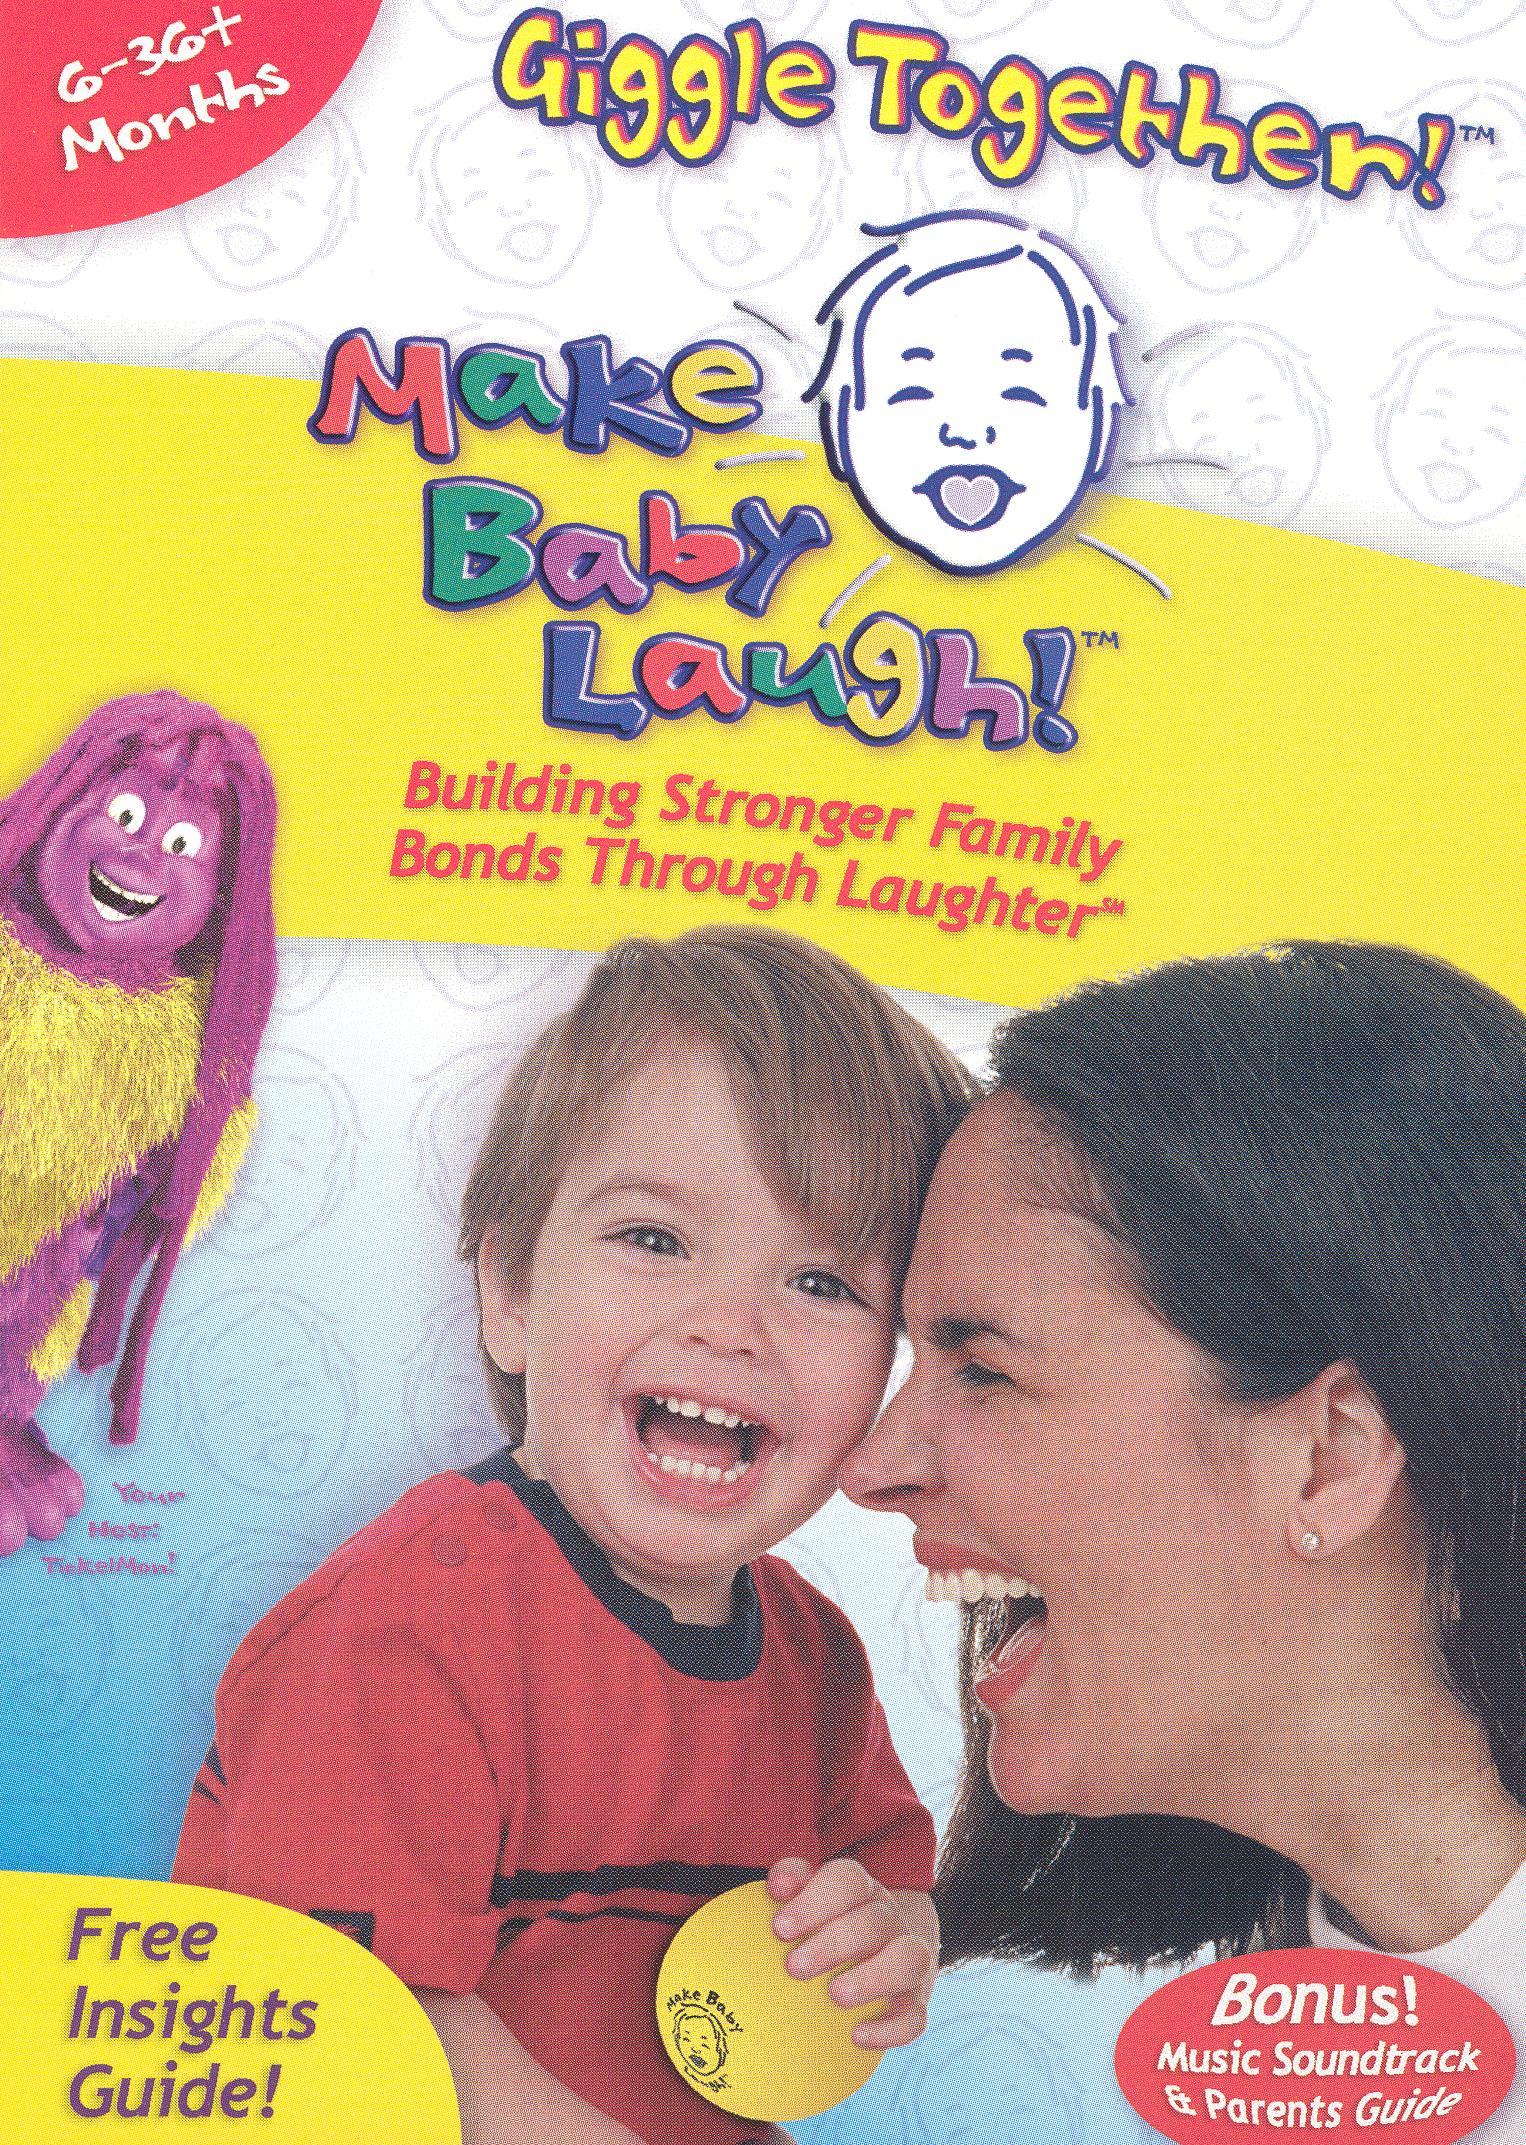 Make Baby Laugh! Giggle Together!